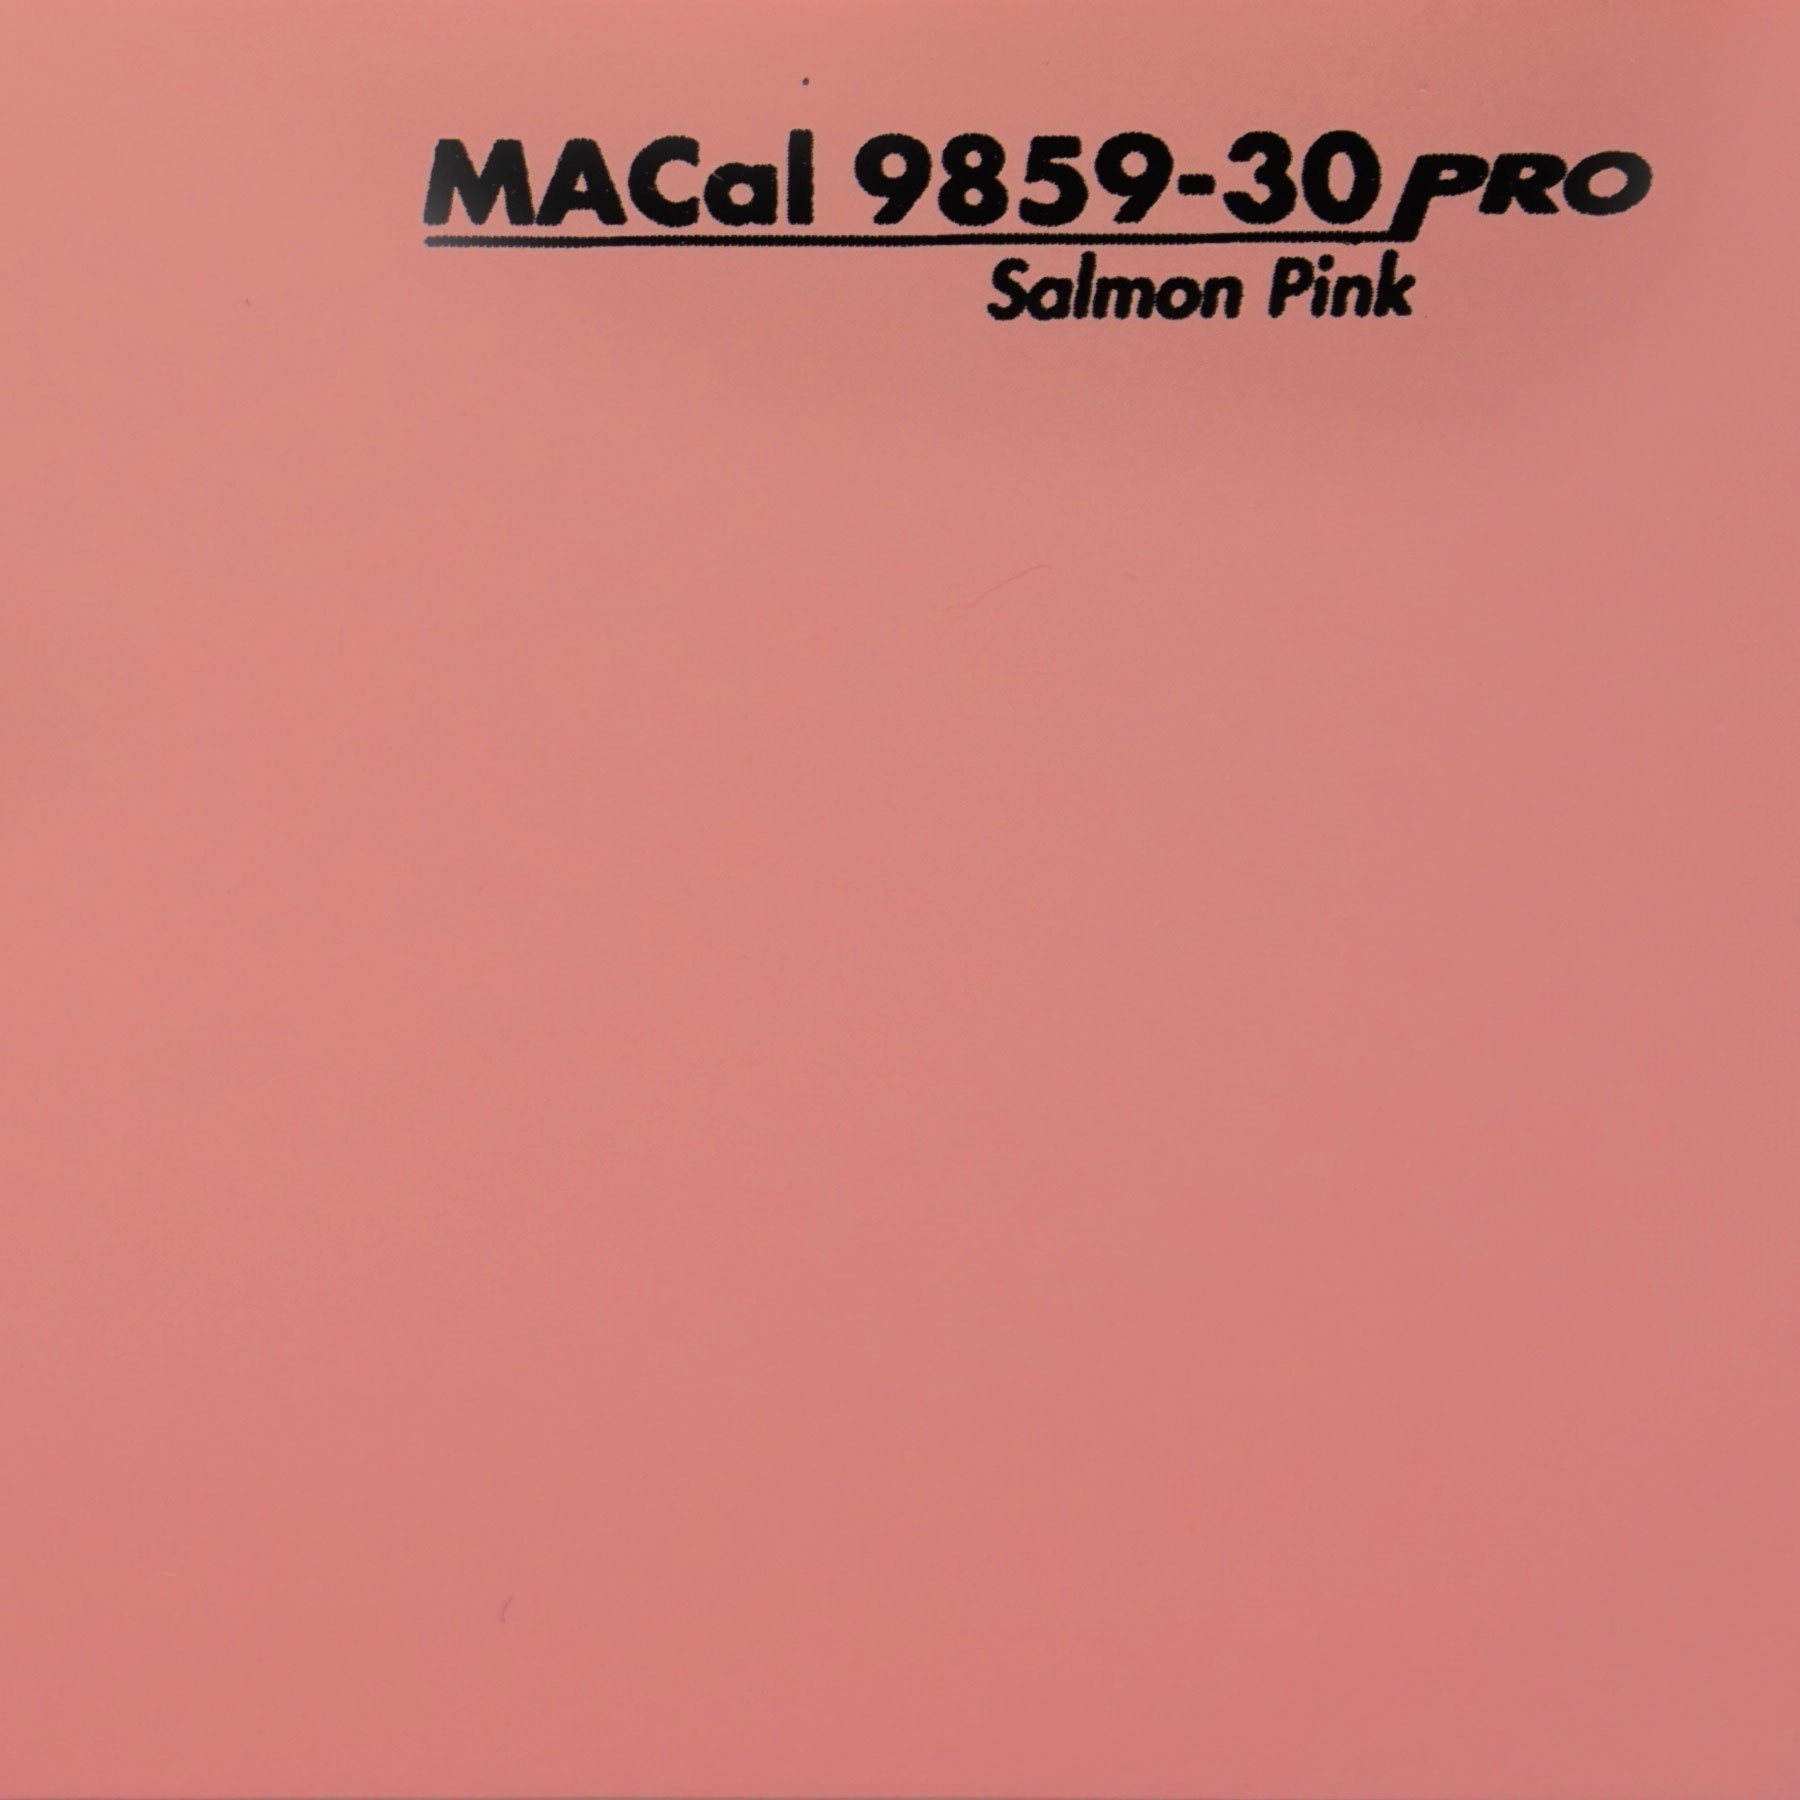 5,98 € //m Selbstklebefolie gelb matt 61,5 cm 3 m Klebefolie